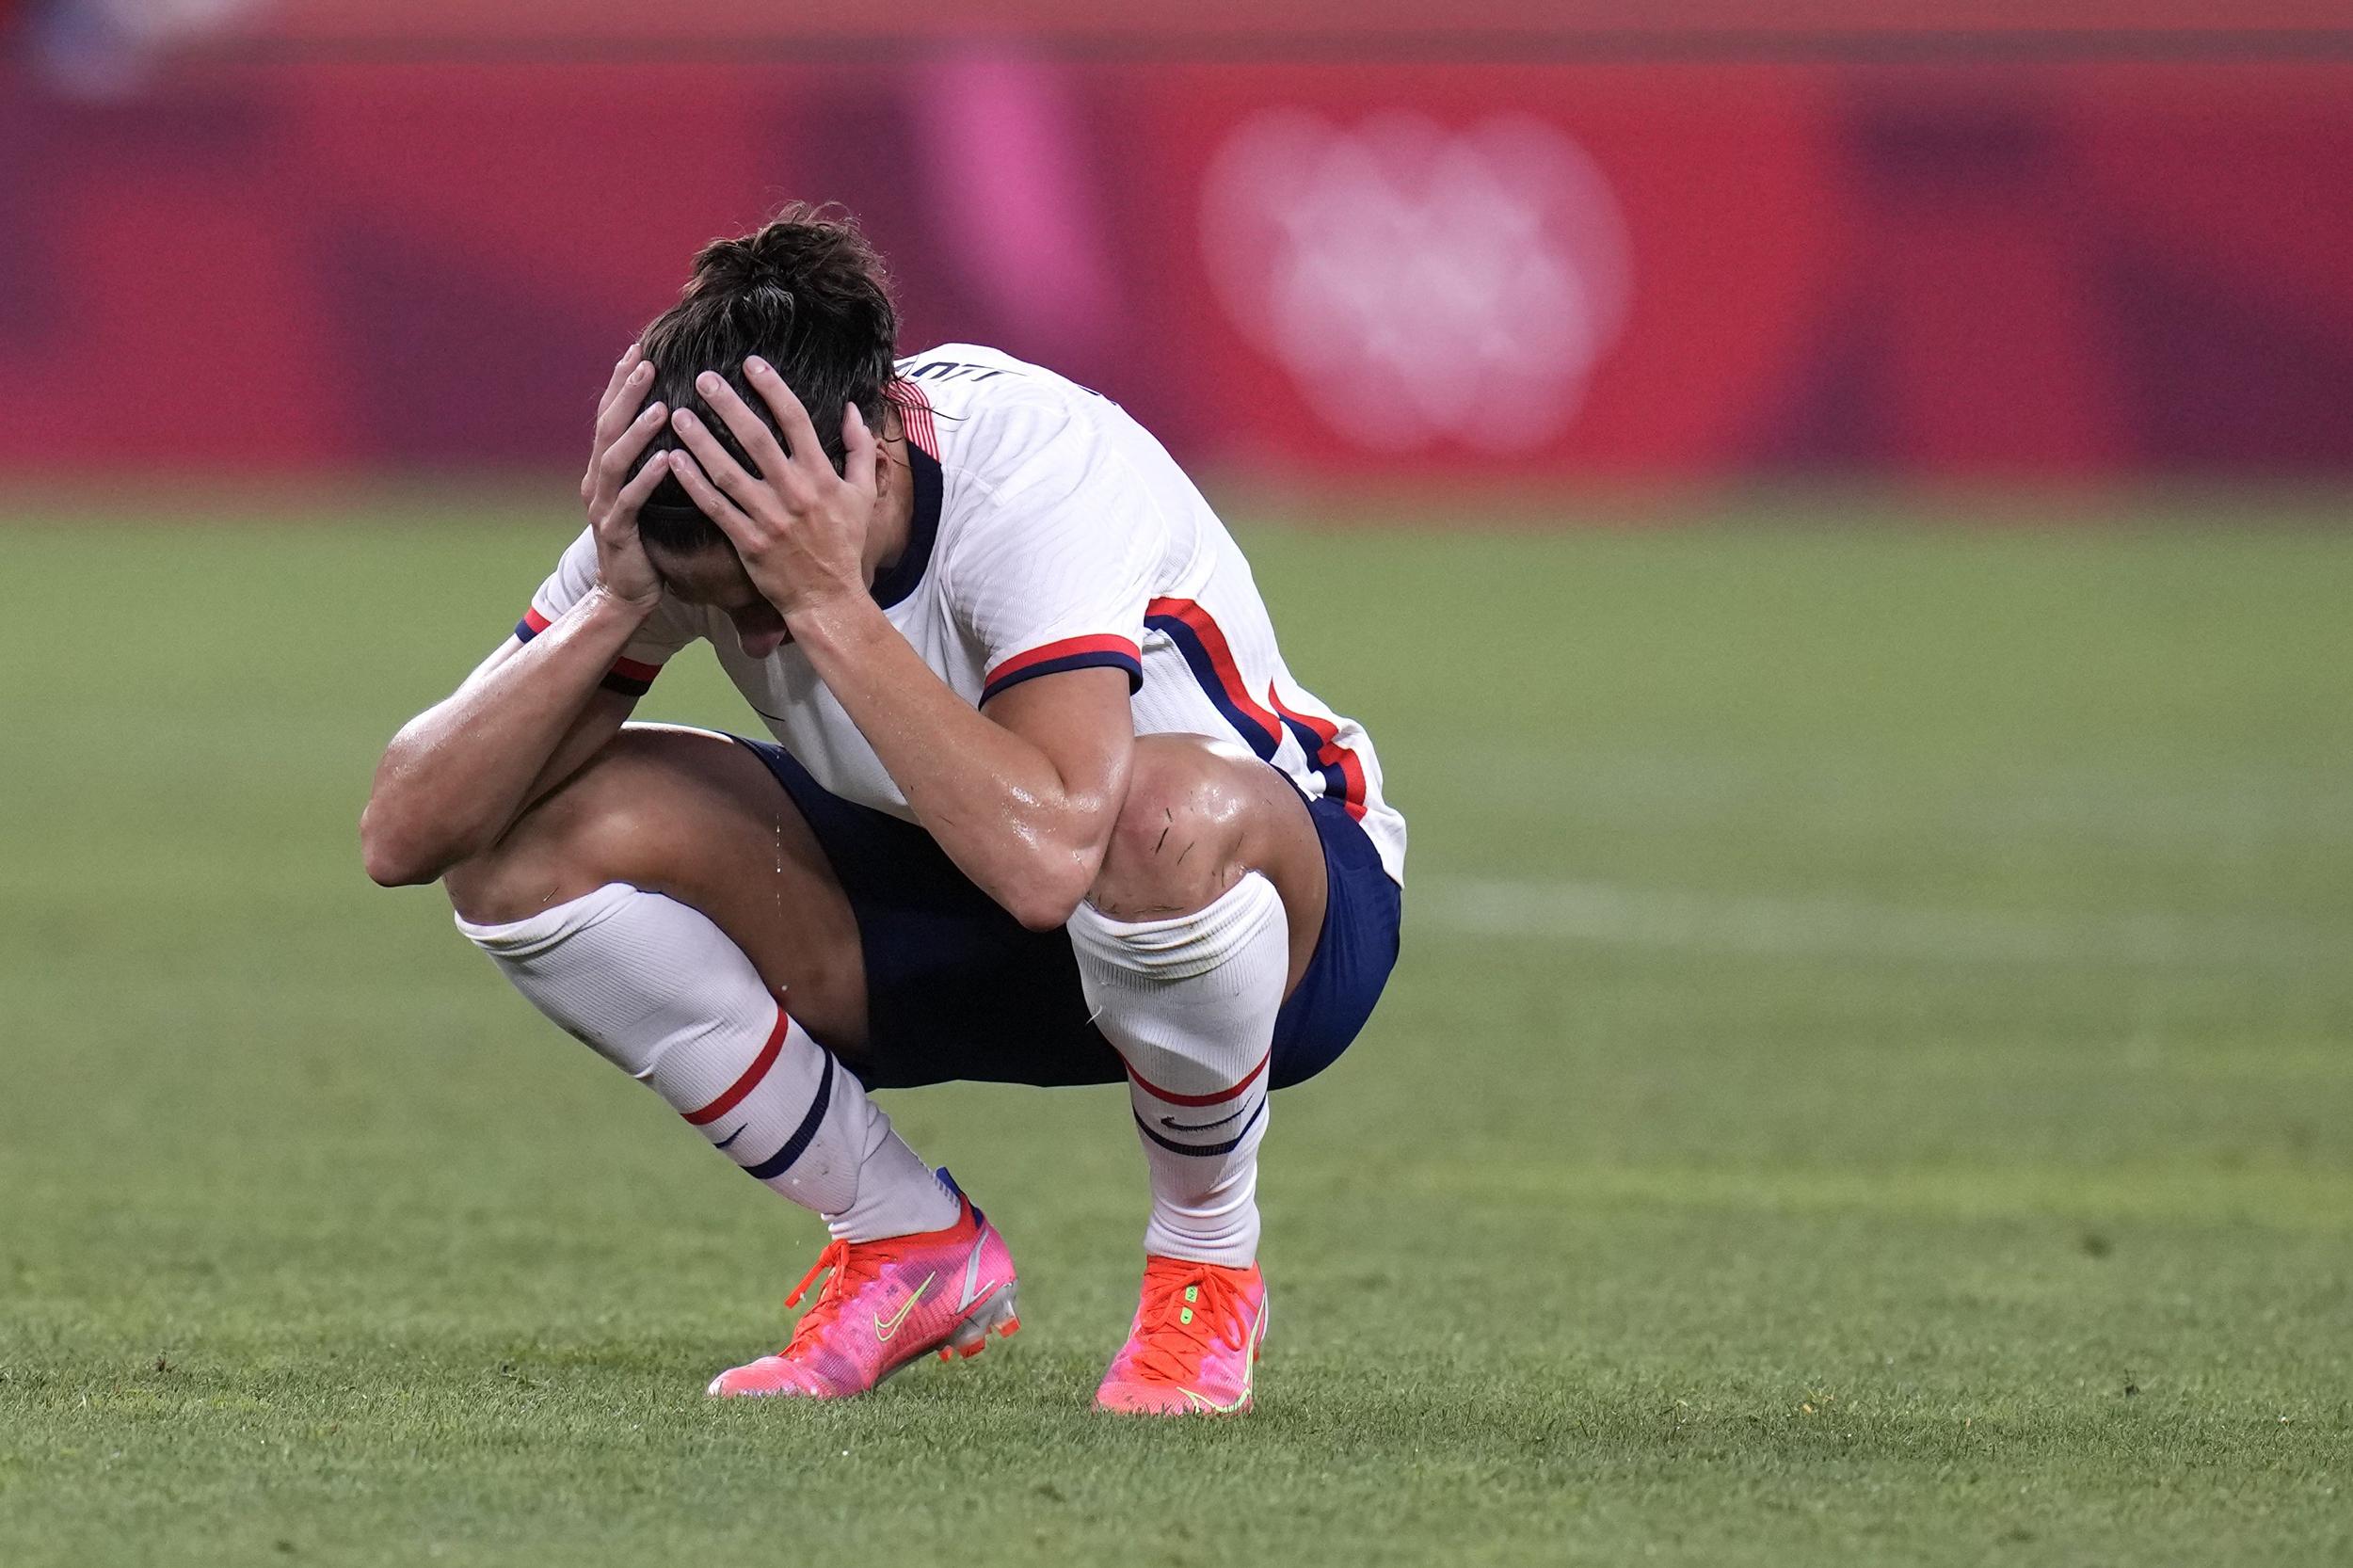 Canada stuns U.S. women in semifinal, ending bid for soccer gold